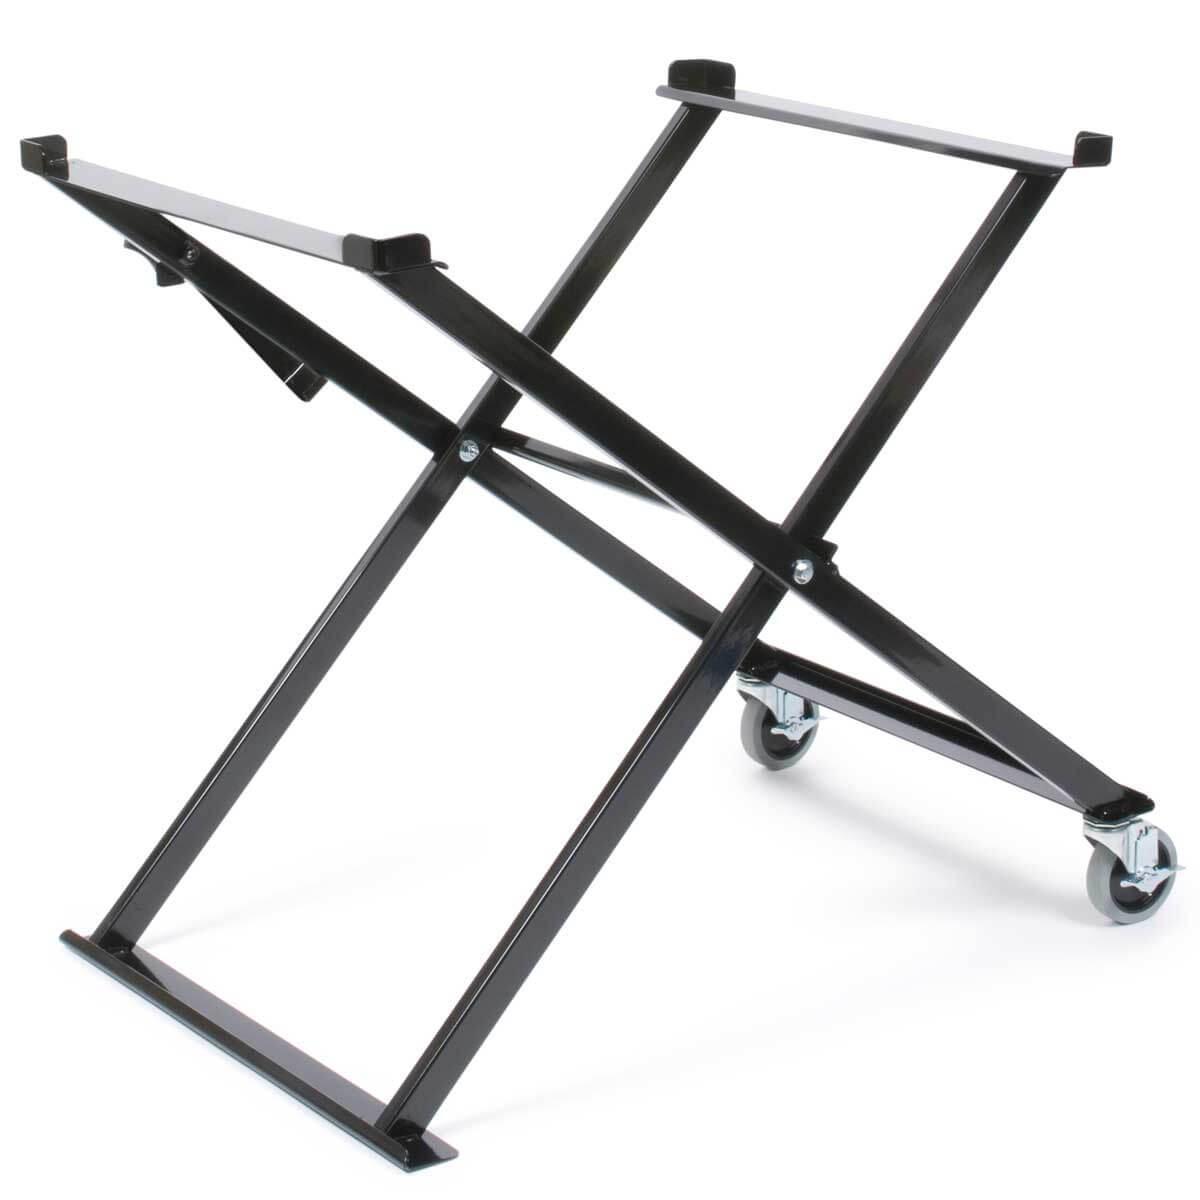 mk diamond bx-4 folding stand